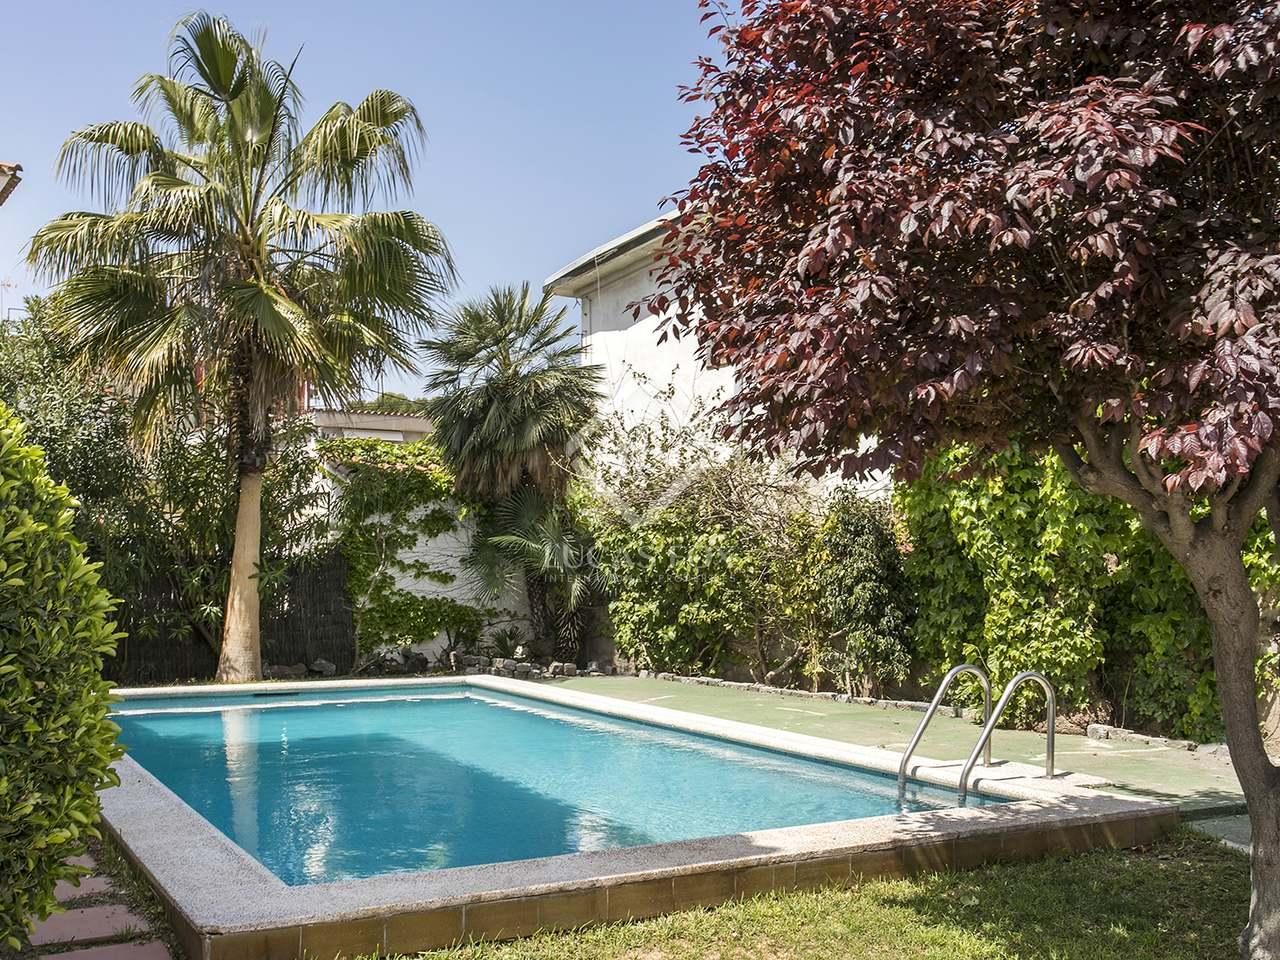 Casa de 150m en alquiler en castelldefels barcelona for Piscina castelldefels